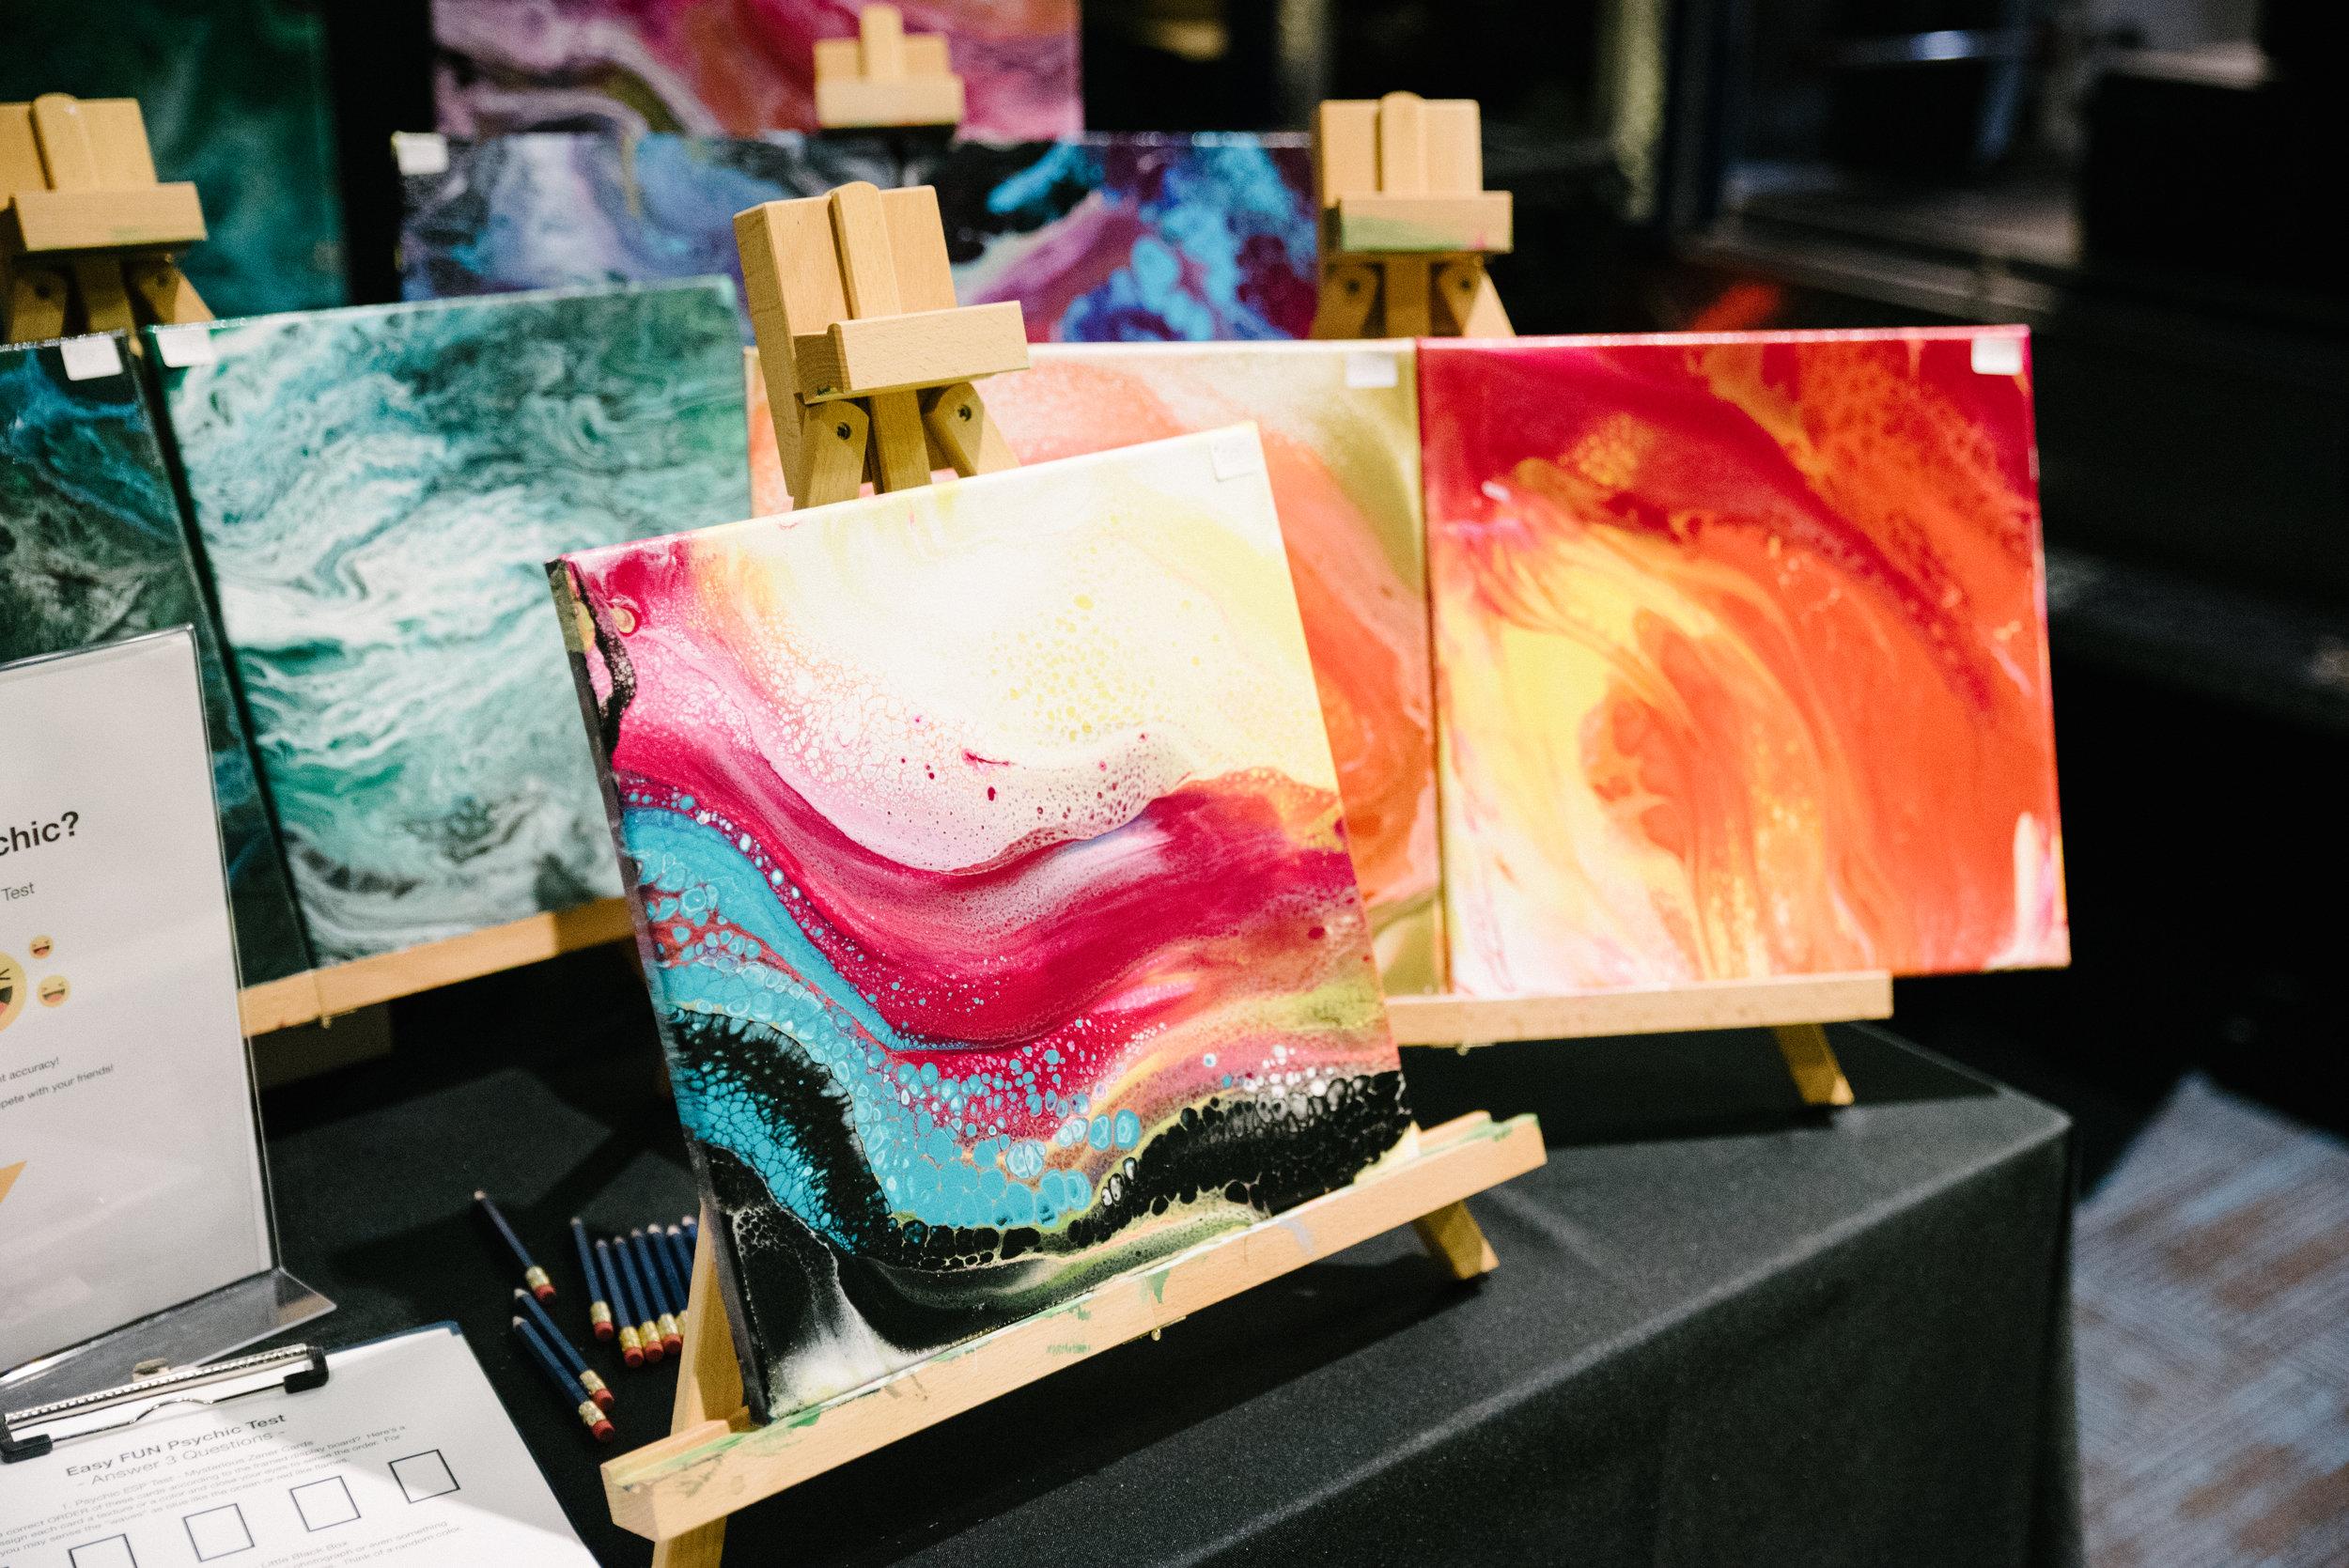 More aura paintings from Nedra Khamsao Yang.